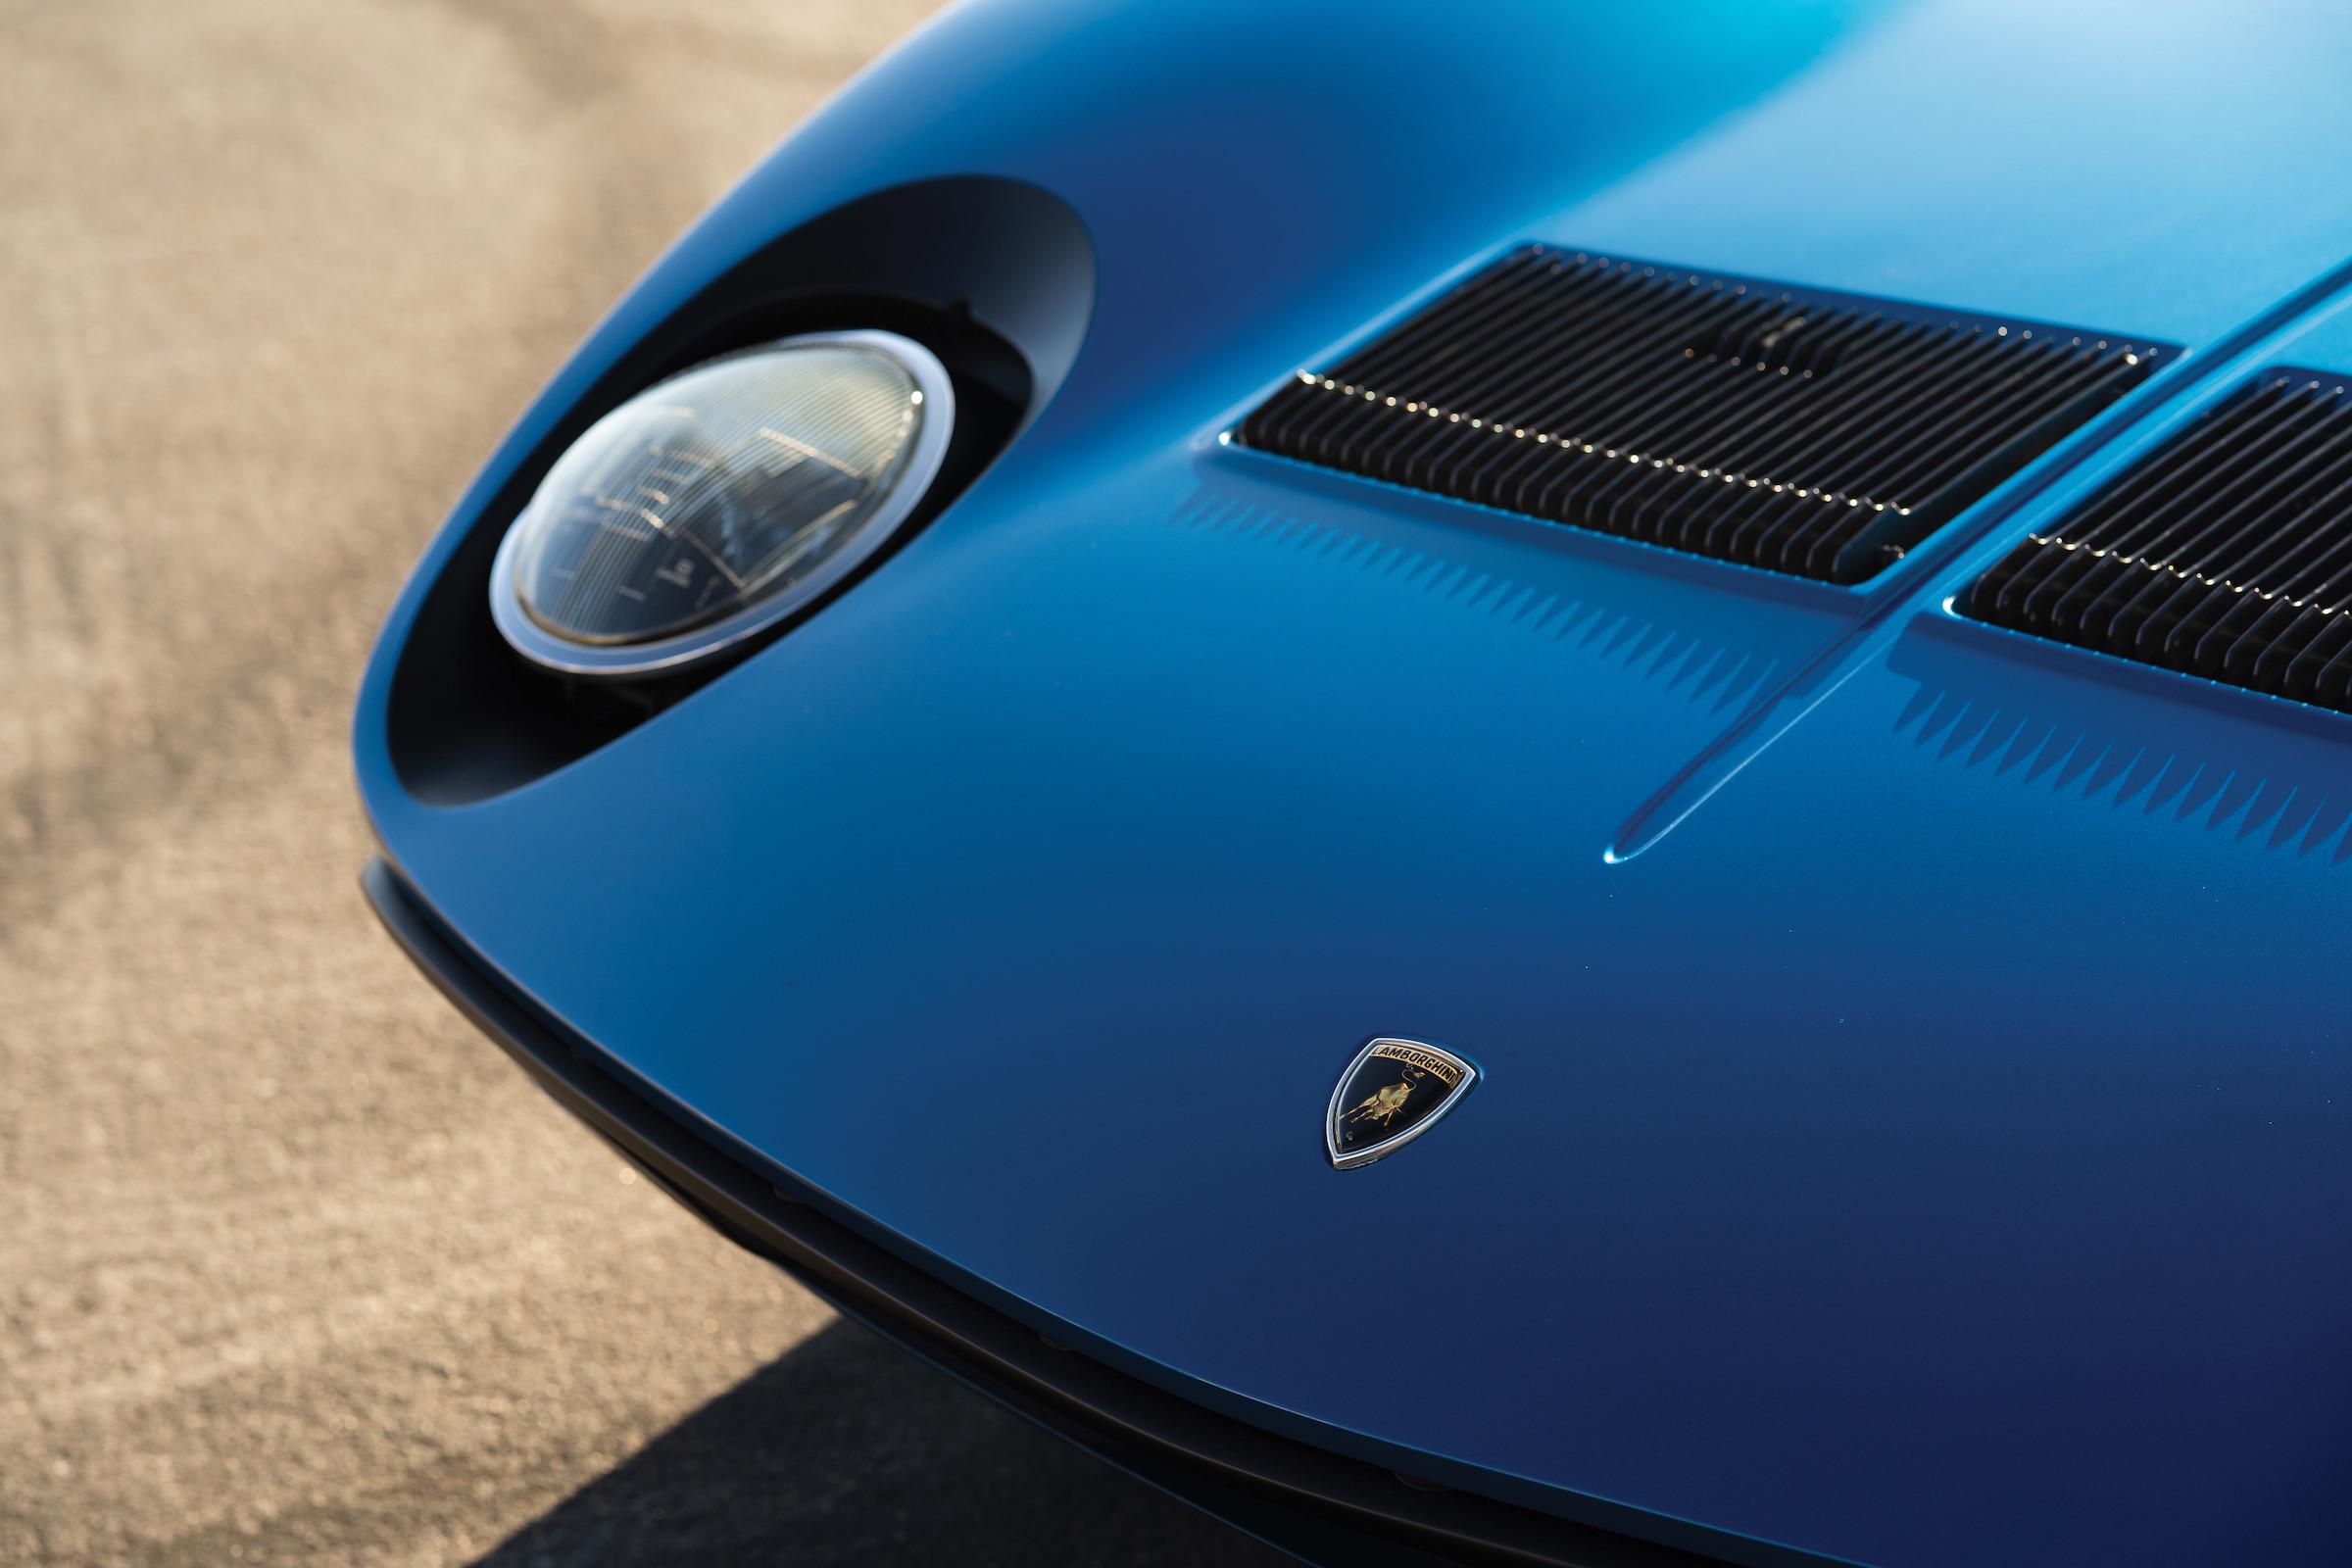 Lamborghini Miura P400 Sv The Godfather Of All Modern Supercars